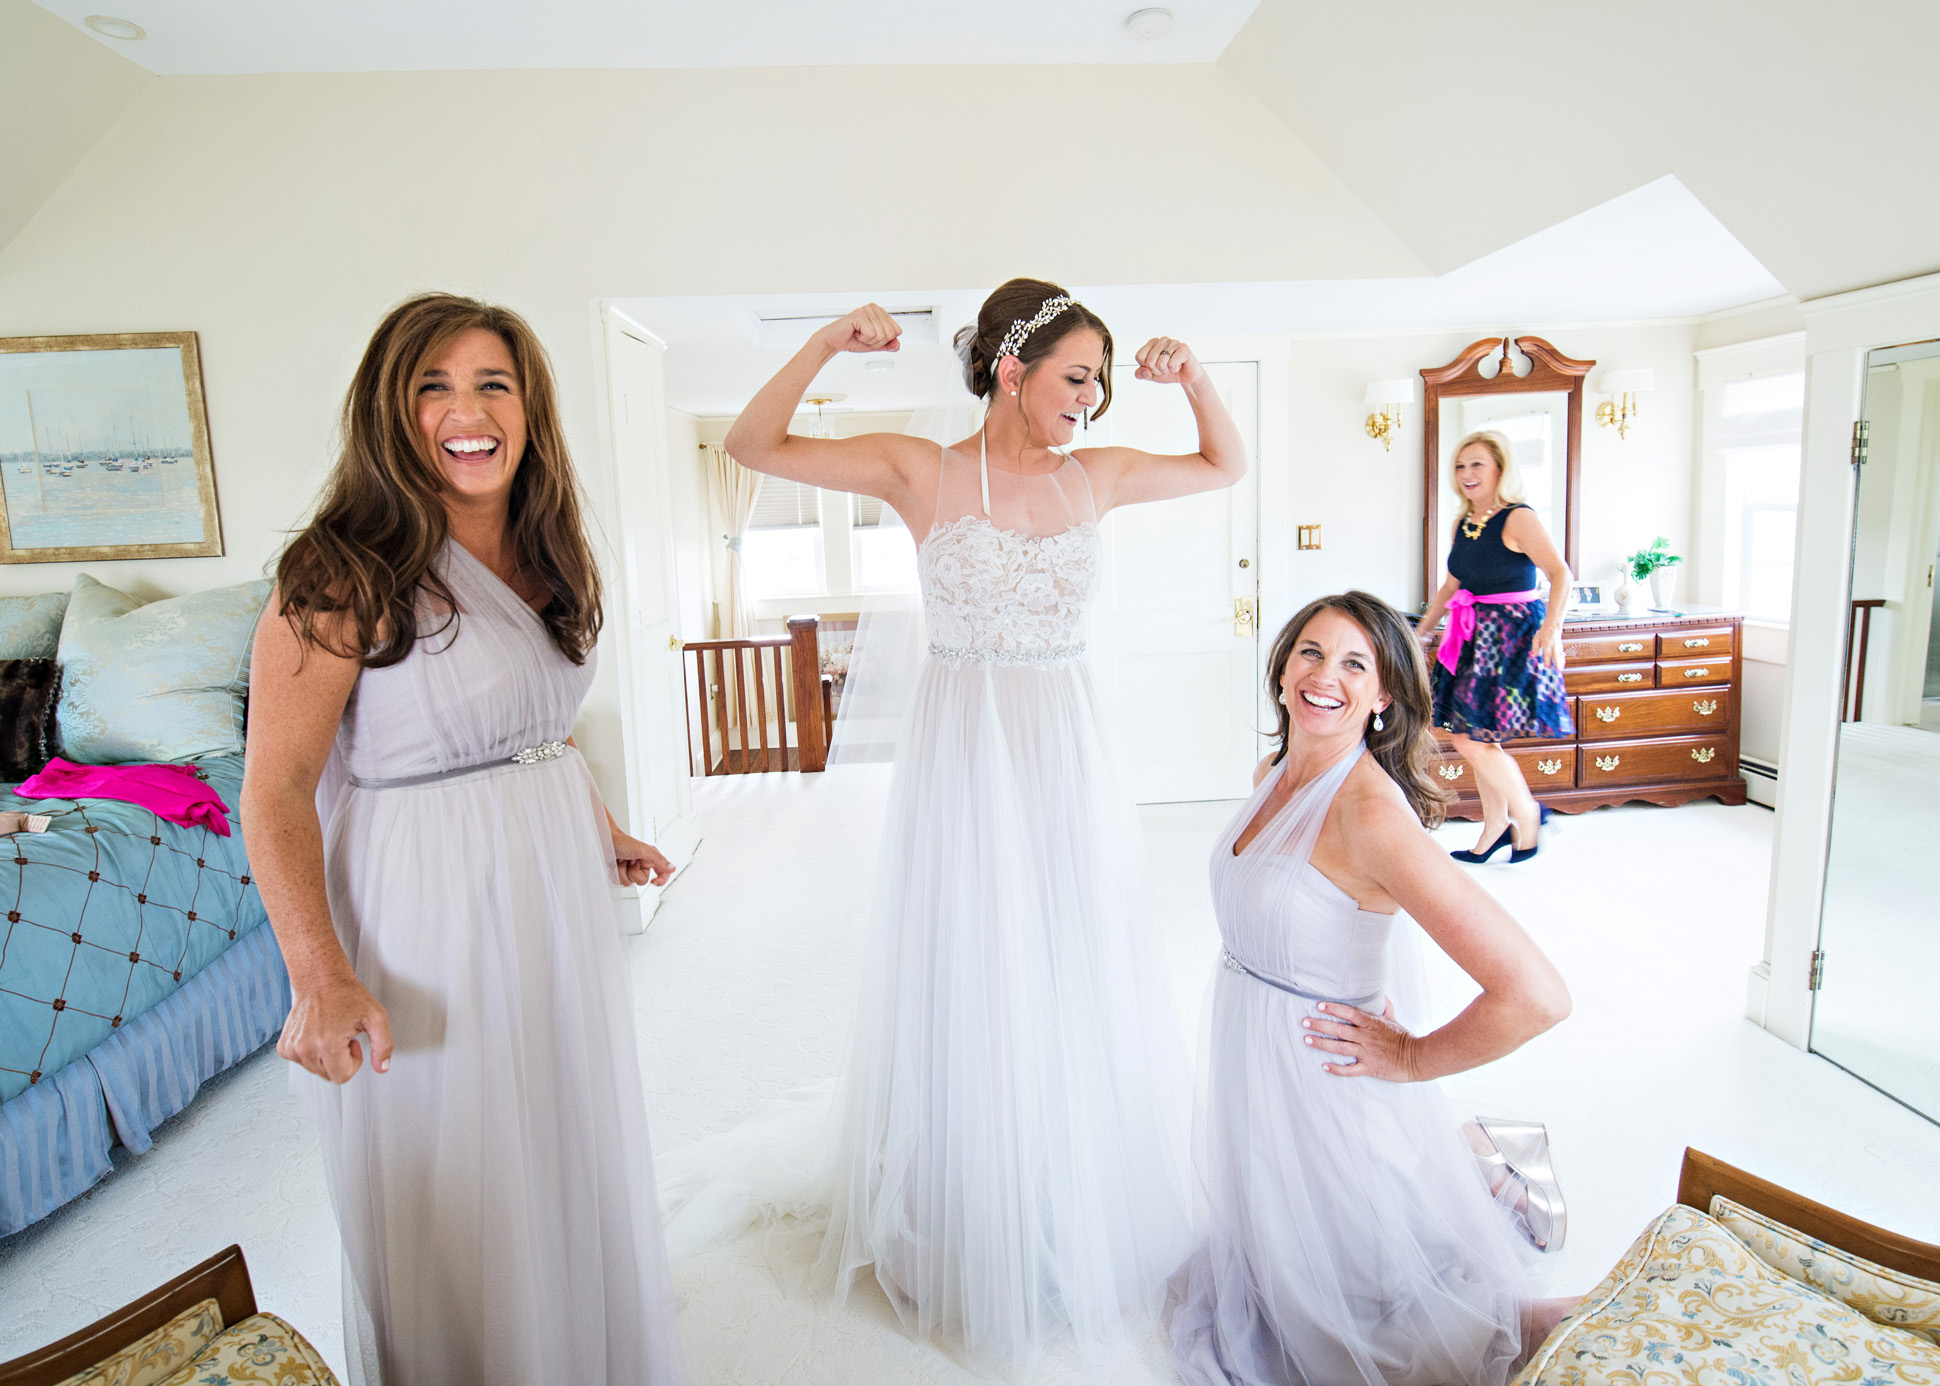 04-Sara Stadtmiller-SRS-Photography-Asbury-Park-Wedding-Photographer-Monmouth-County-Wedding-Photographer-NJ-Wedding-Photographer-Avon-by-the-Sea-Wedding-The-Columns-Wedding-bhldn-dress